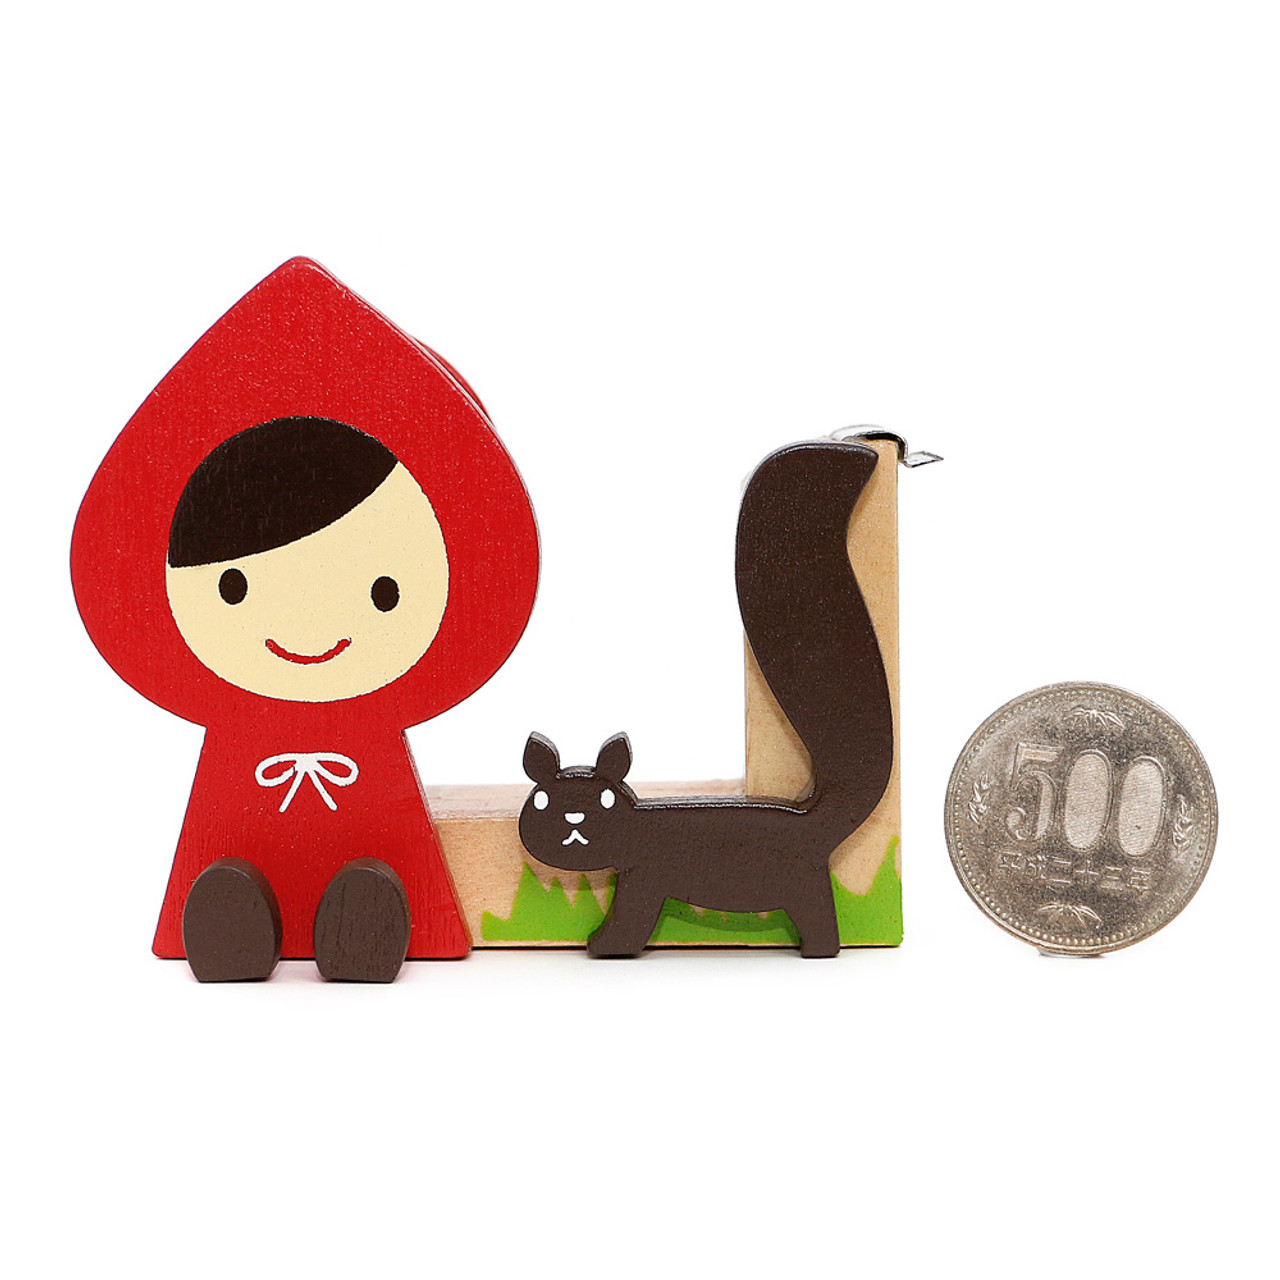 Decole Little Red Hood Tape Dispenser ( Proportion )